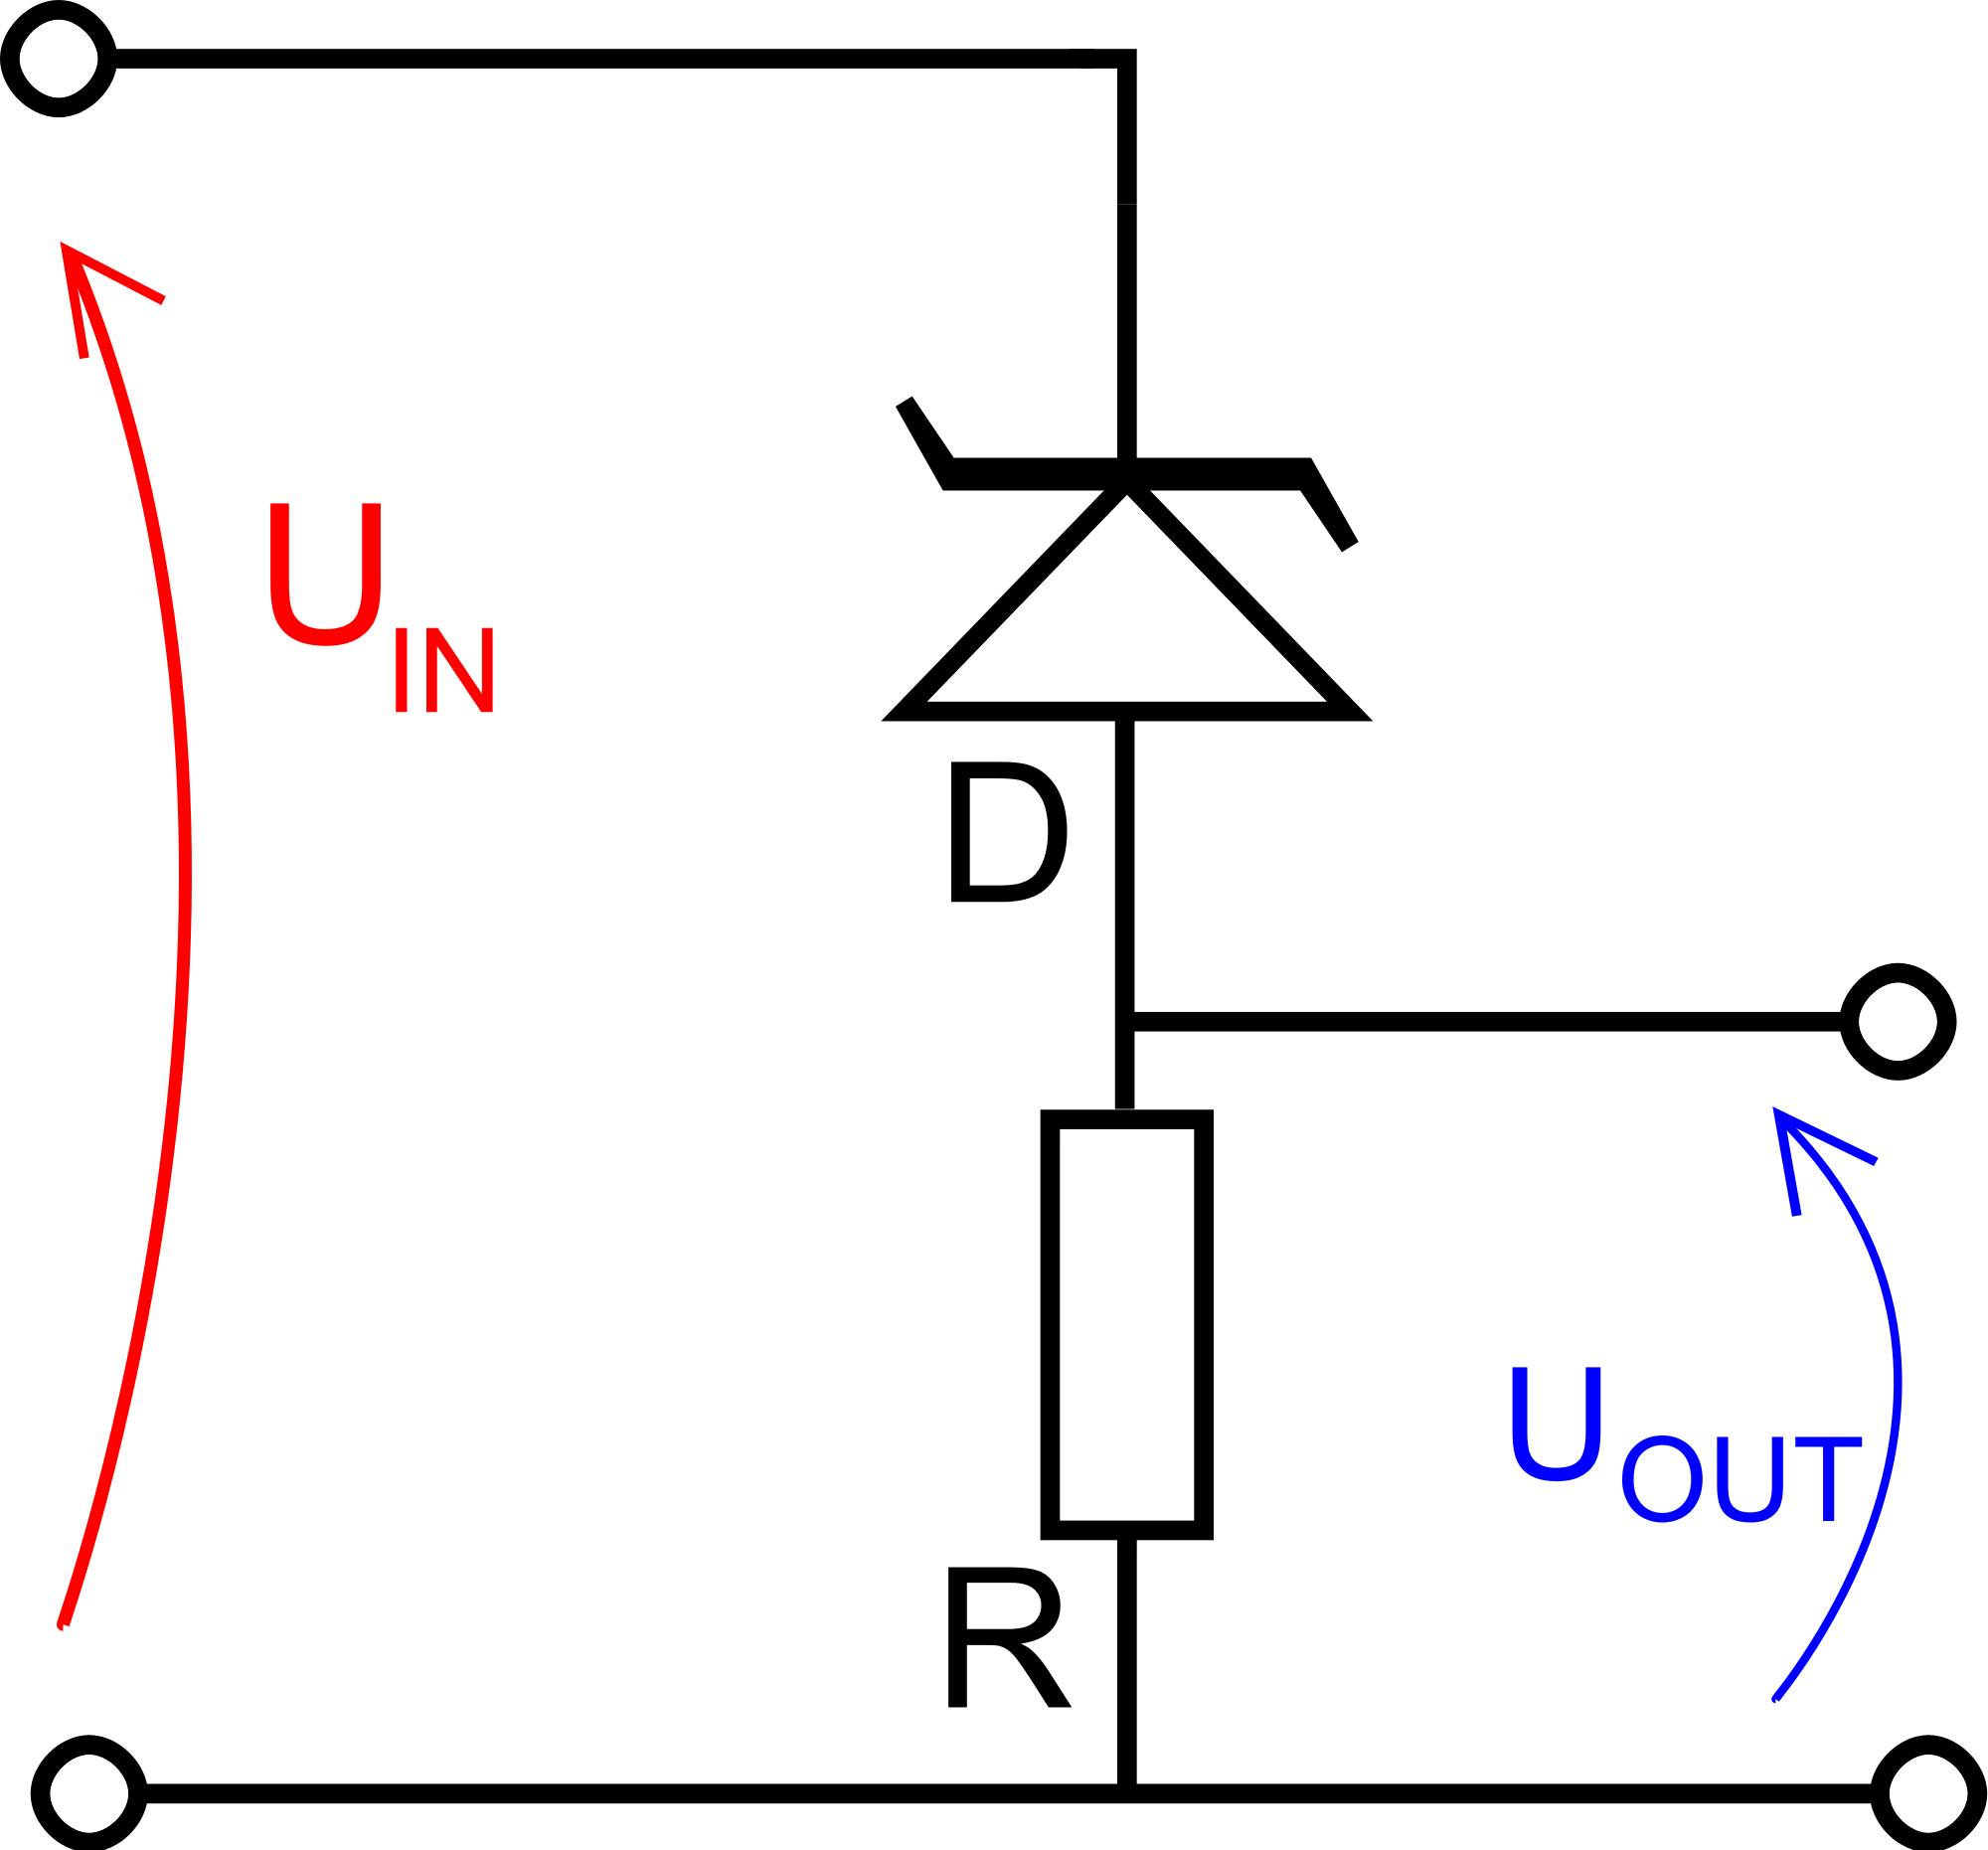 Electrical Schematic Symbols Pdf Additionally Hvac Schematic Symbols